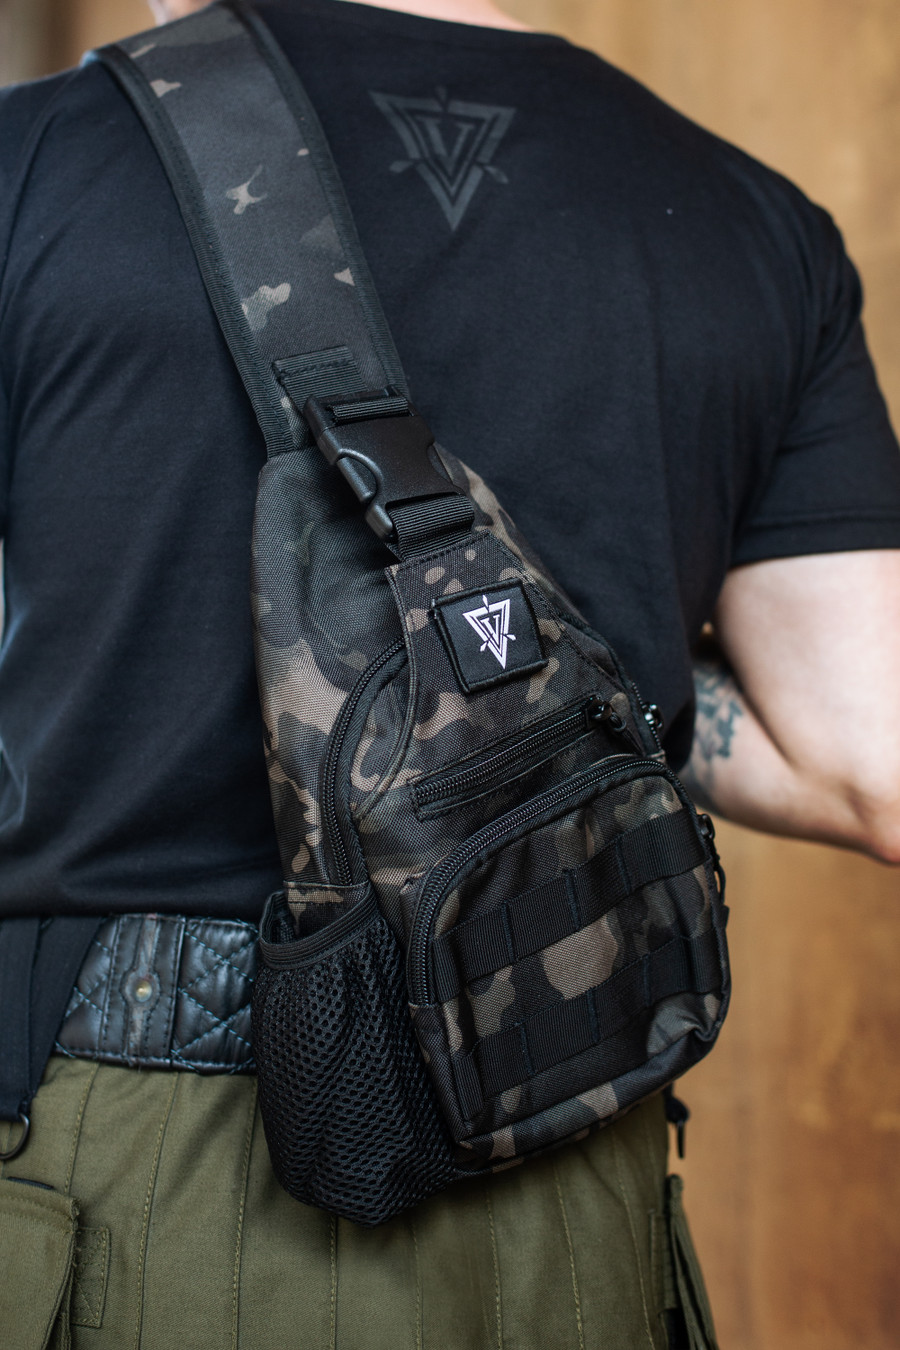 Vanguard XM5 Sling Backpack